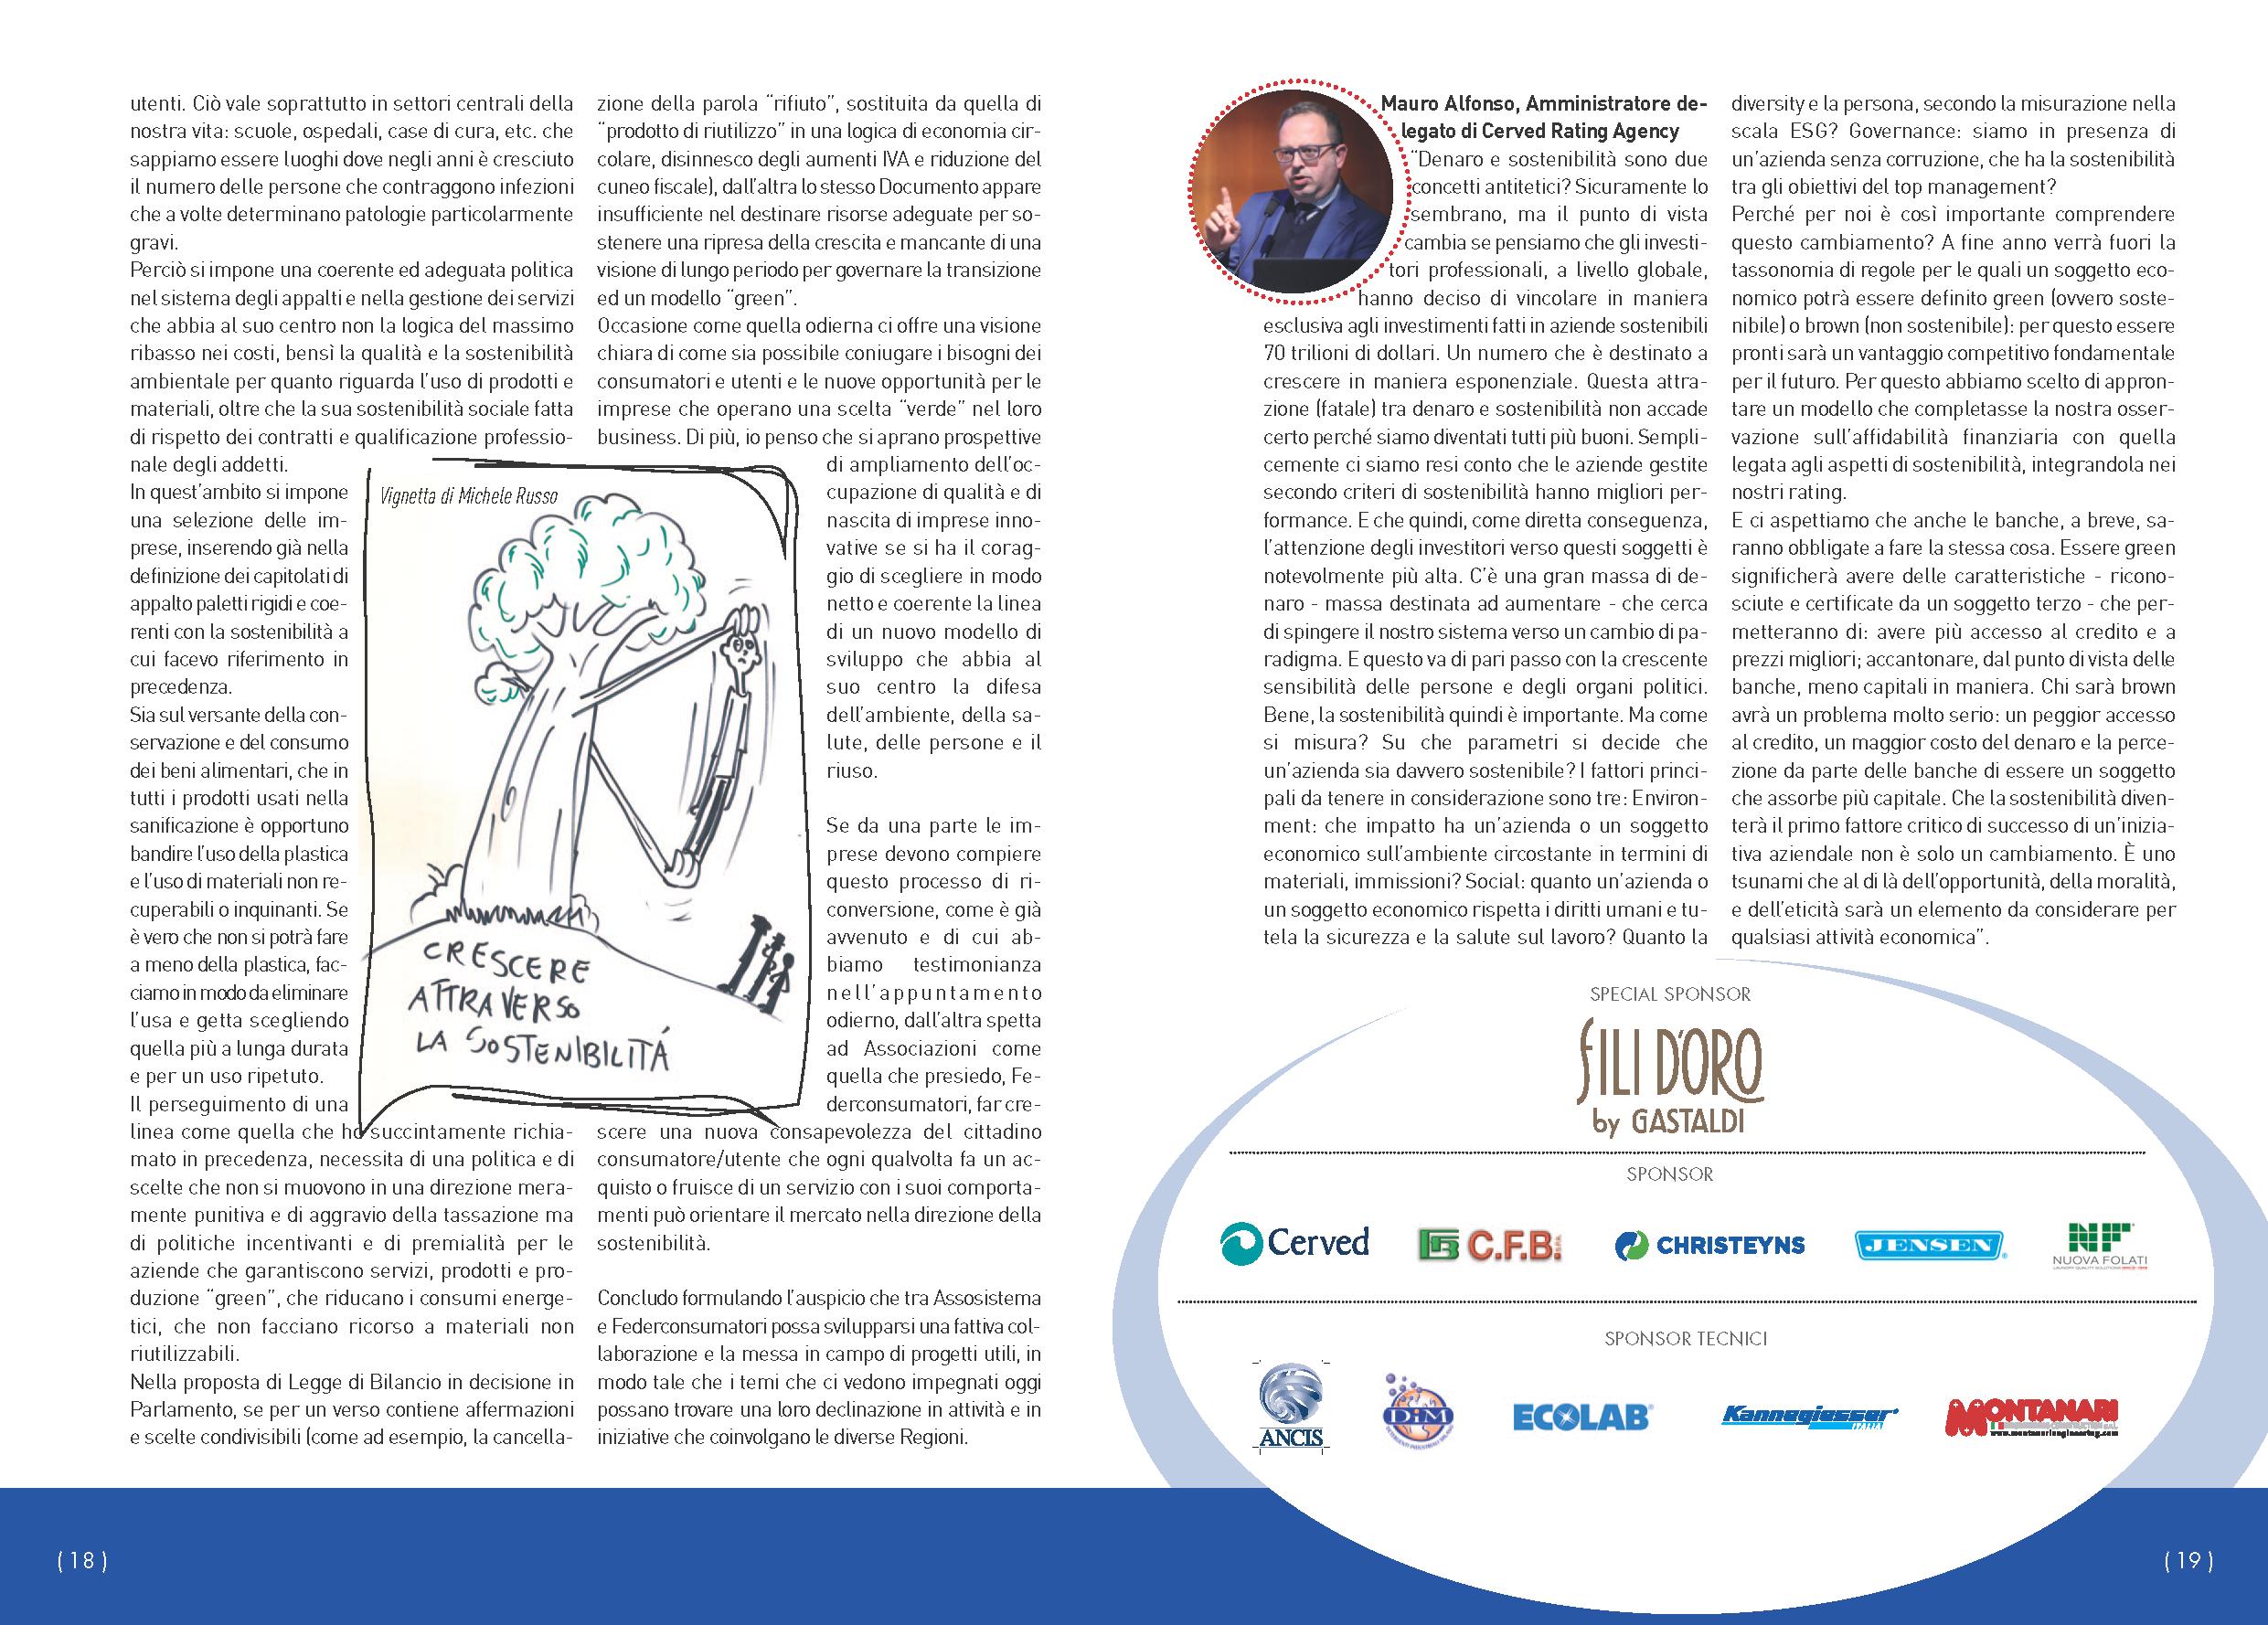 cover_pagina_6